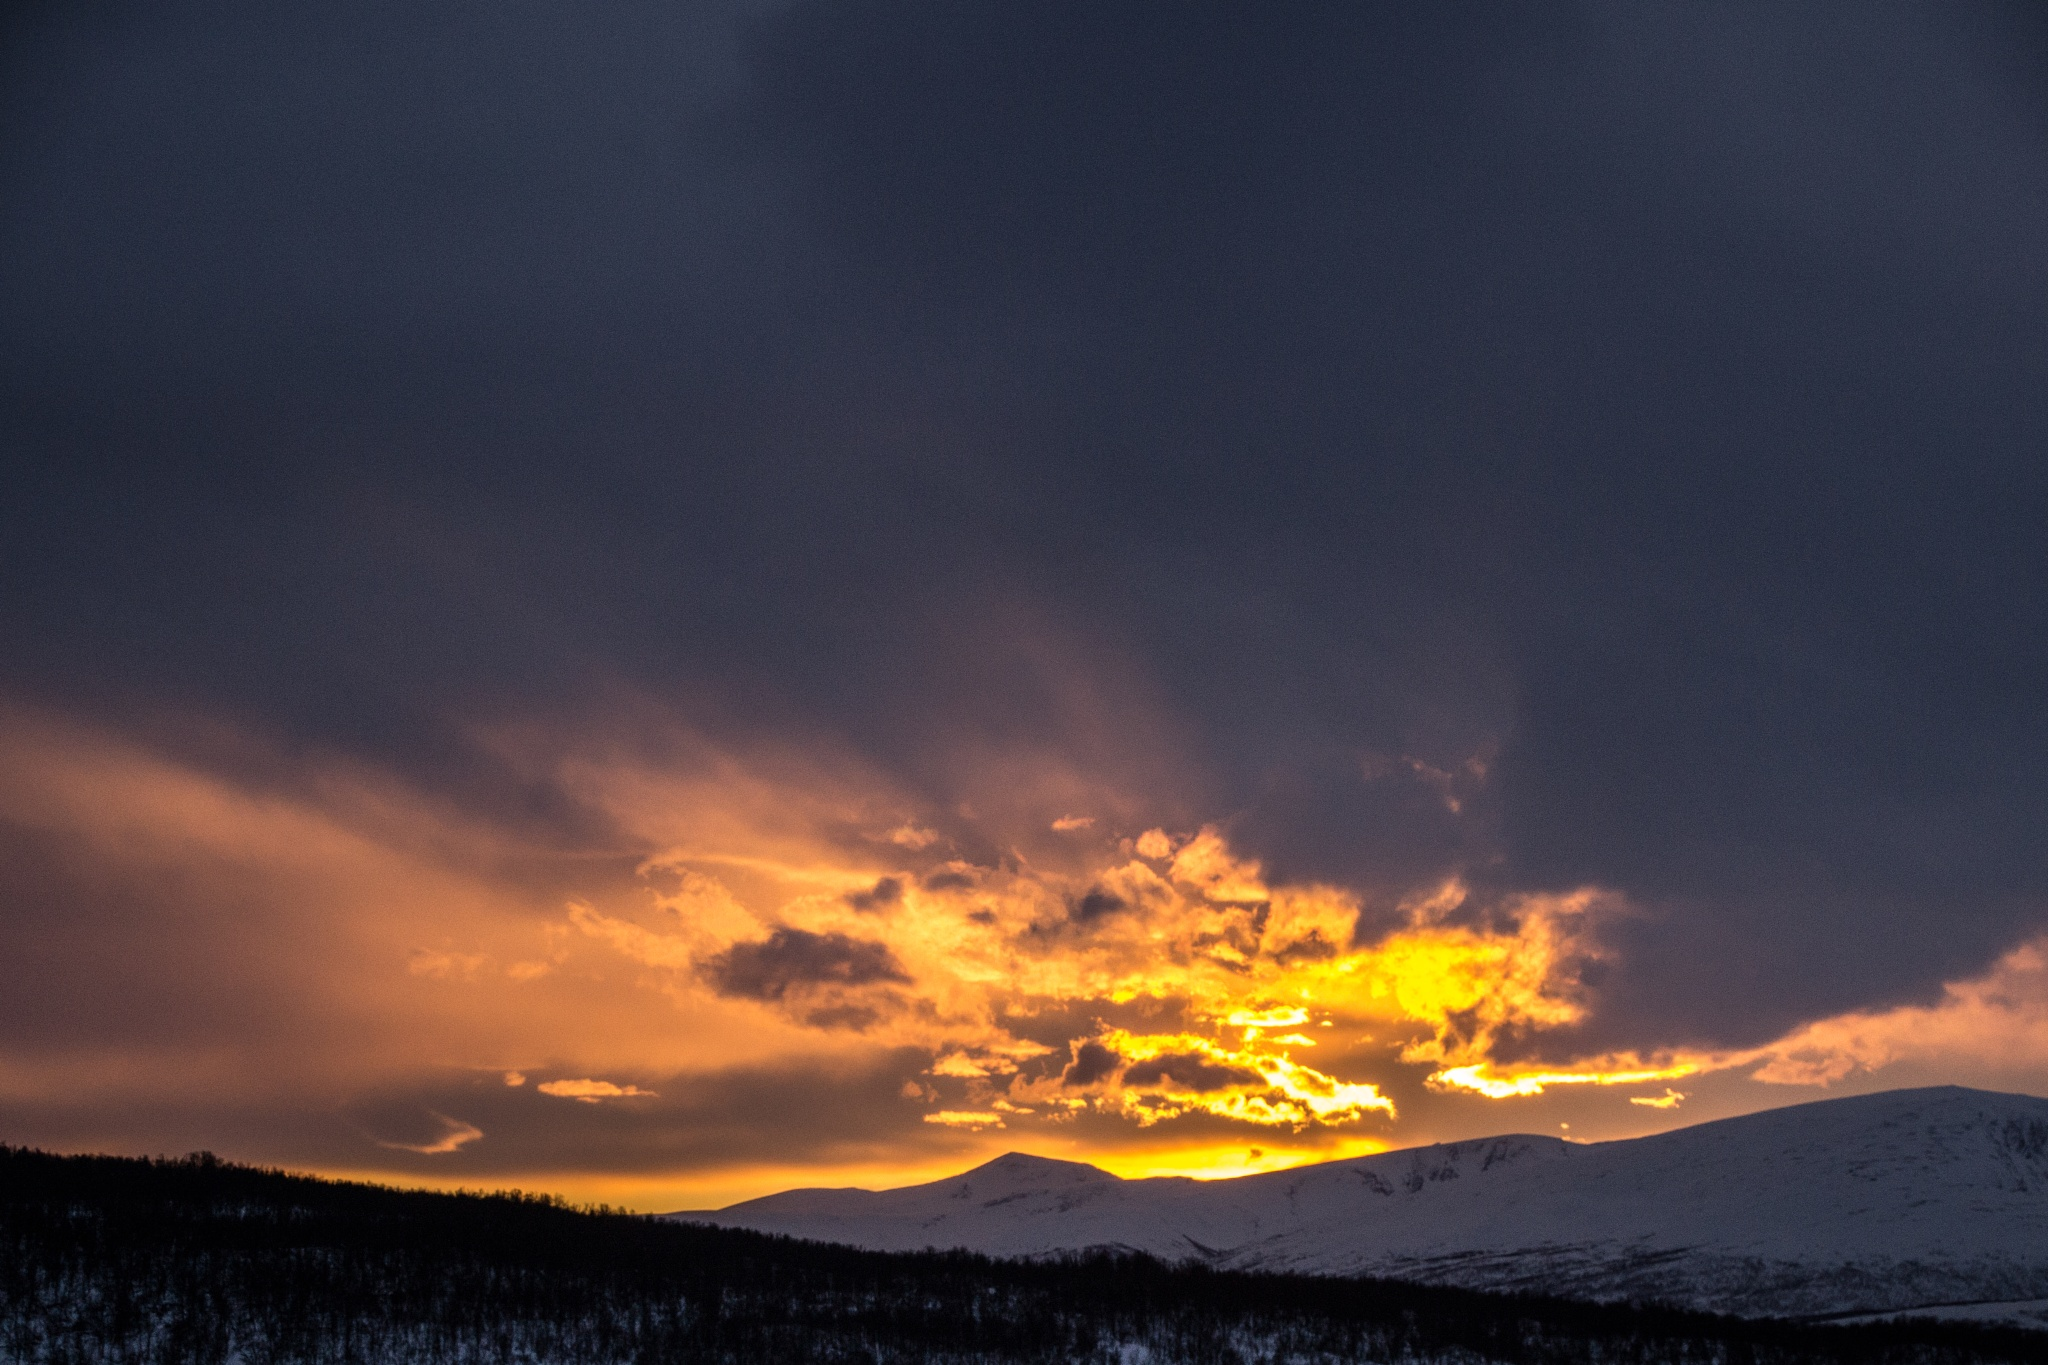 Sunset by SveinBorre